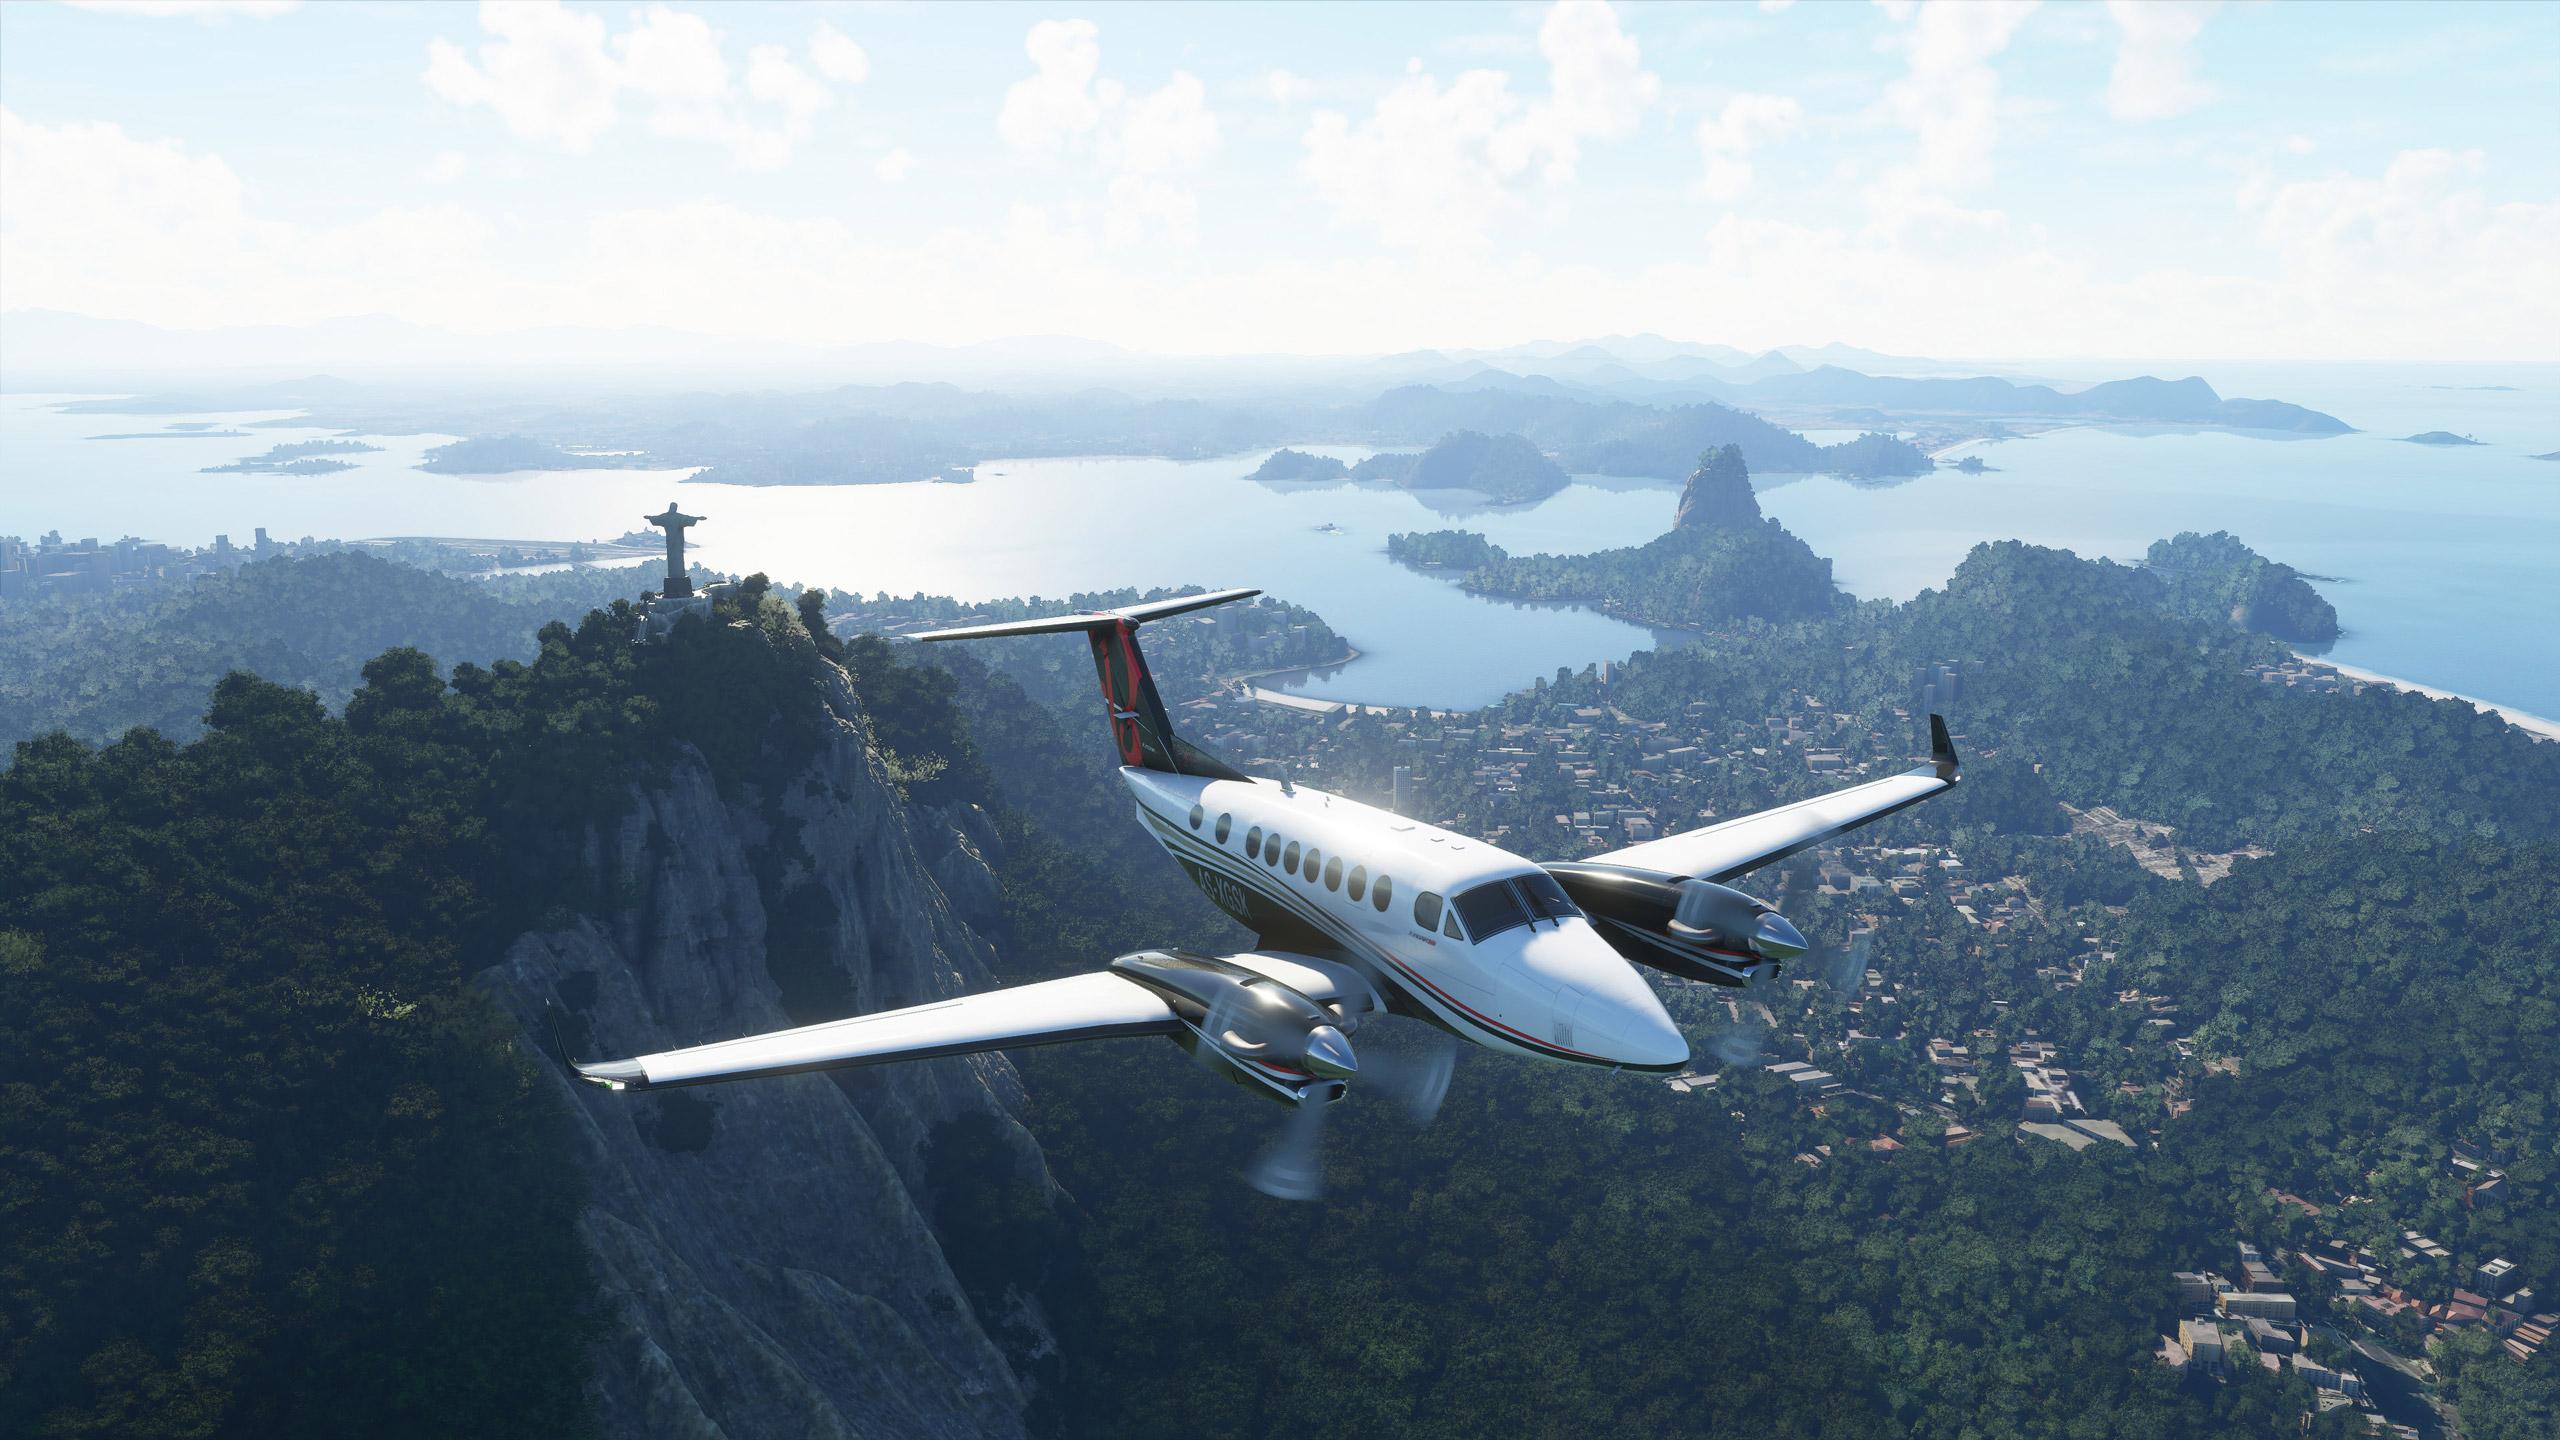 Microsoft Flight Simulator 2020 update 1.8.3.0 patch notes ...